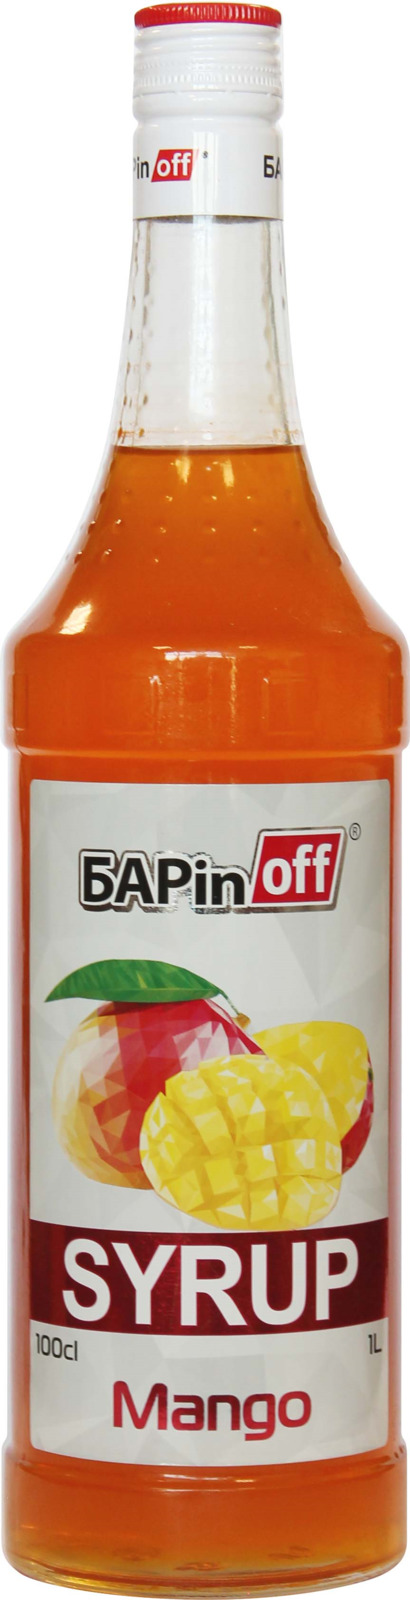 Barinoff Сироп Манго, 1 л